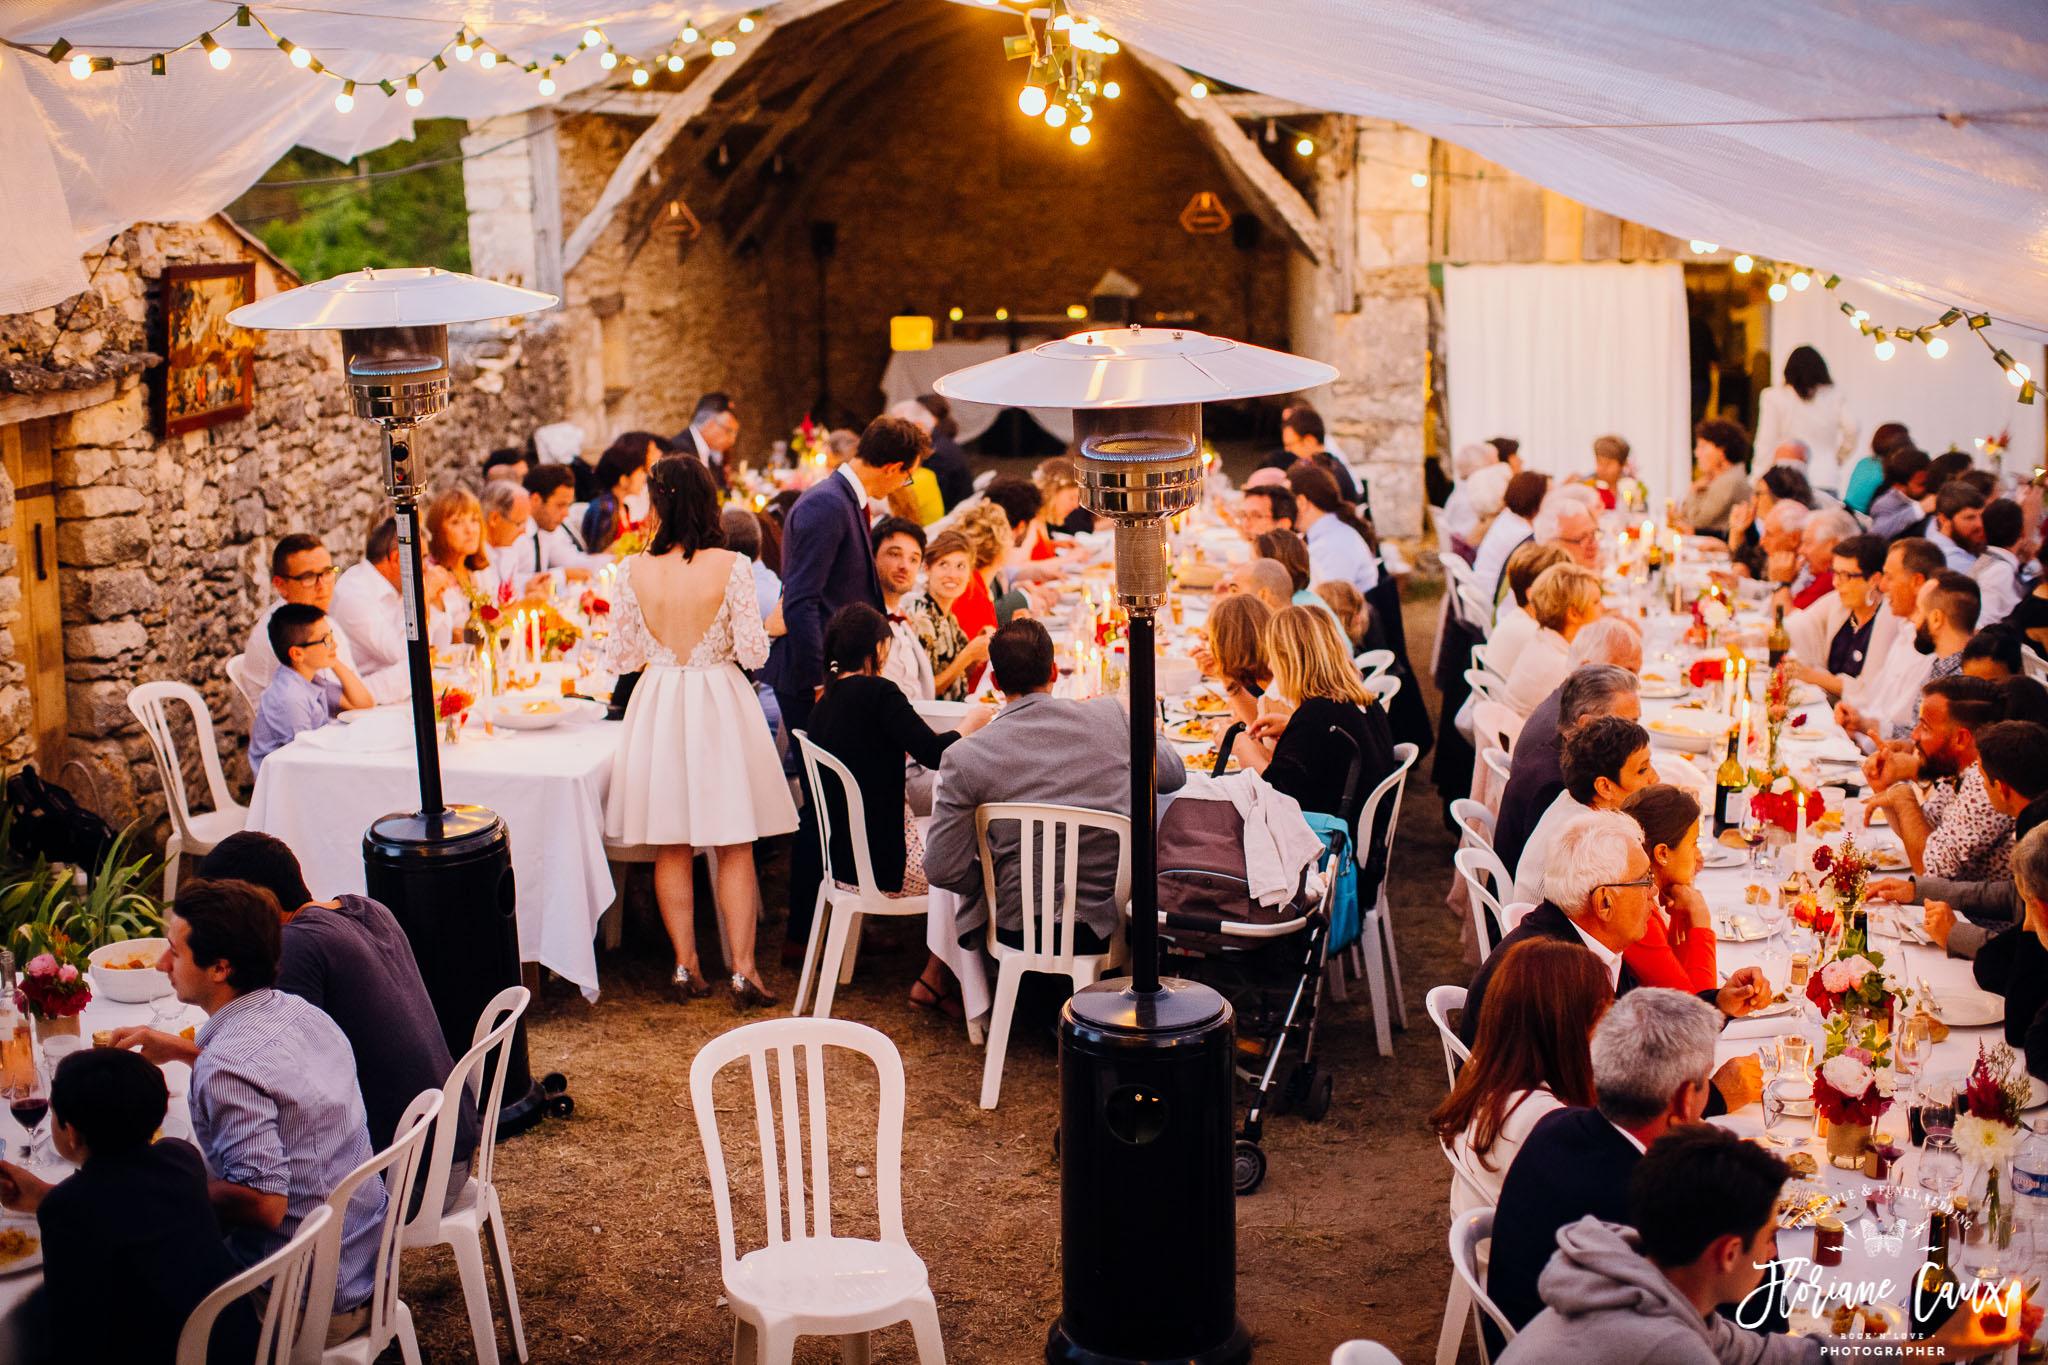 my-dear-festival-party-mariage-chez-soi-5